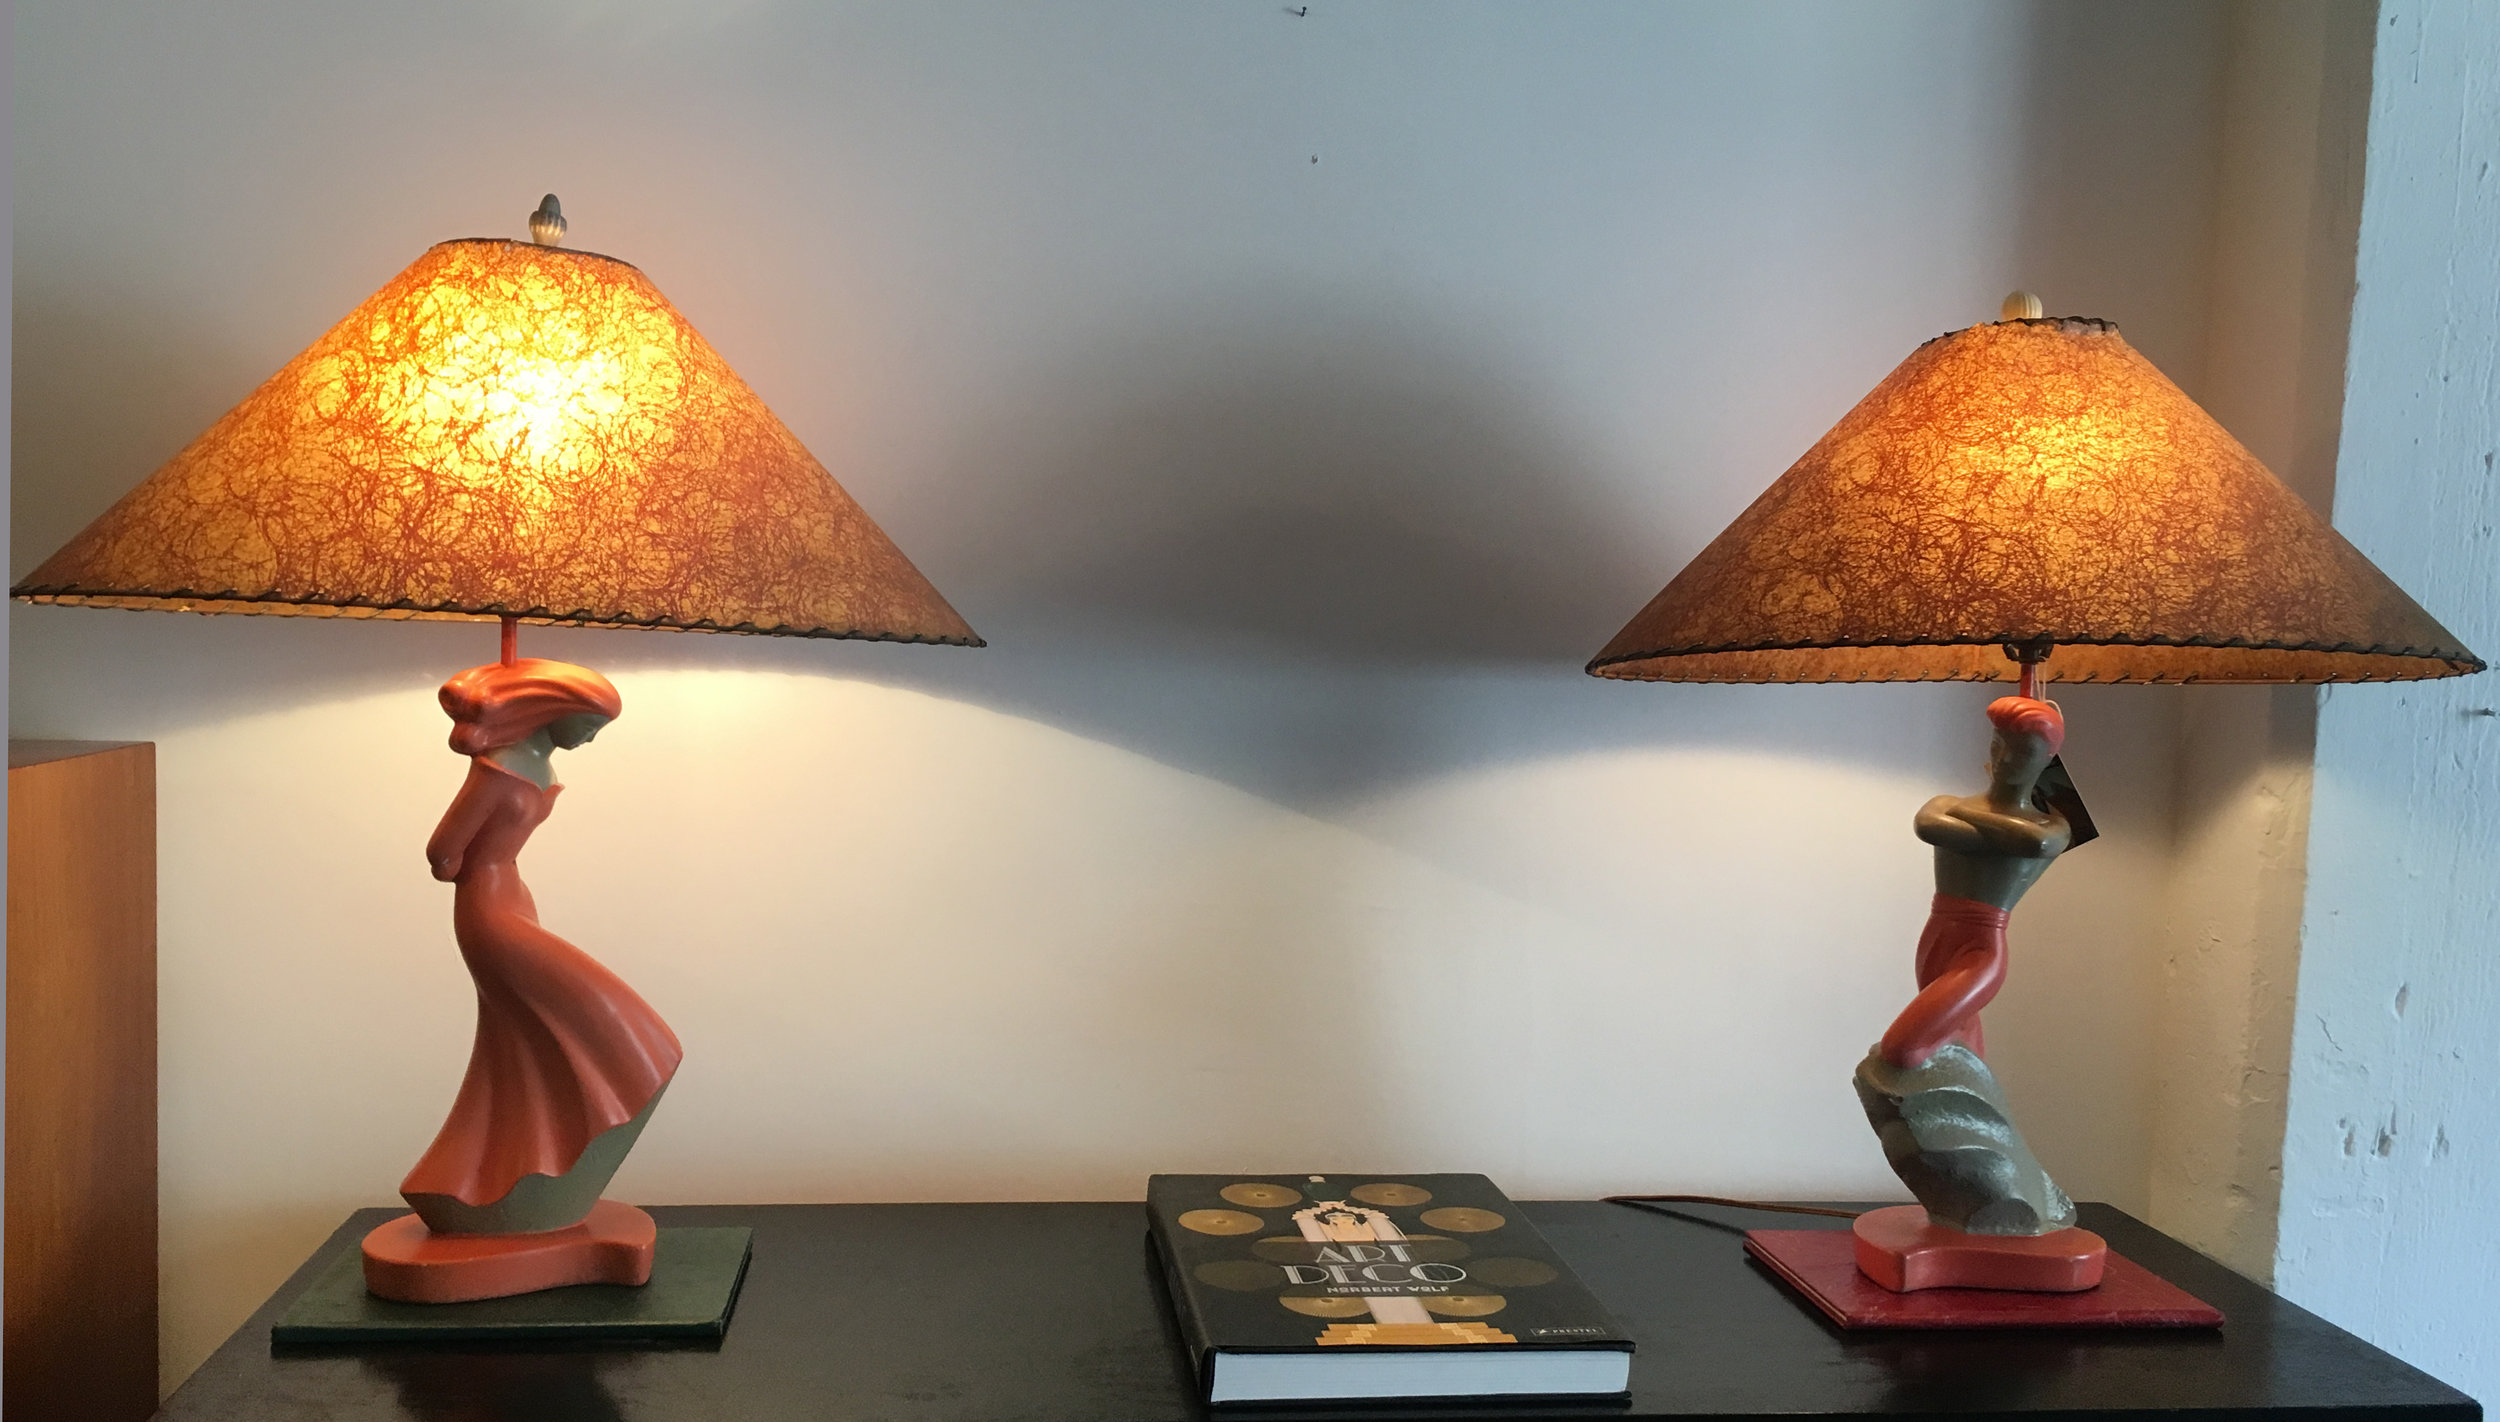 PAIR OF FAIP 1950S CHALKWARE LAMPS